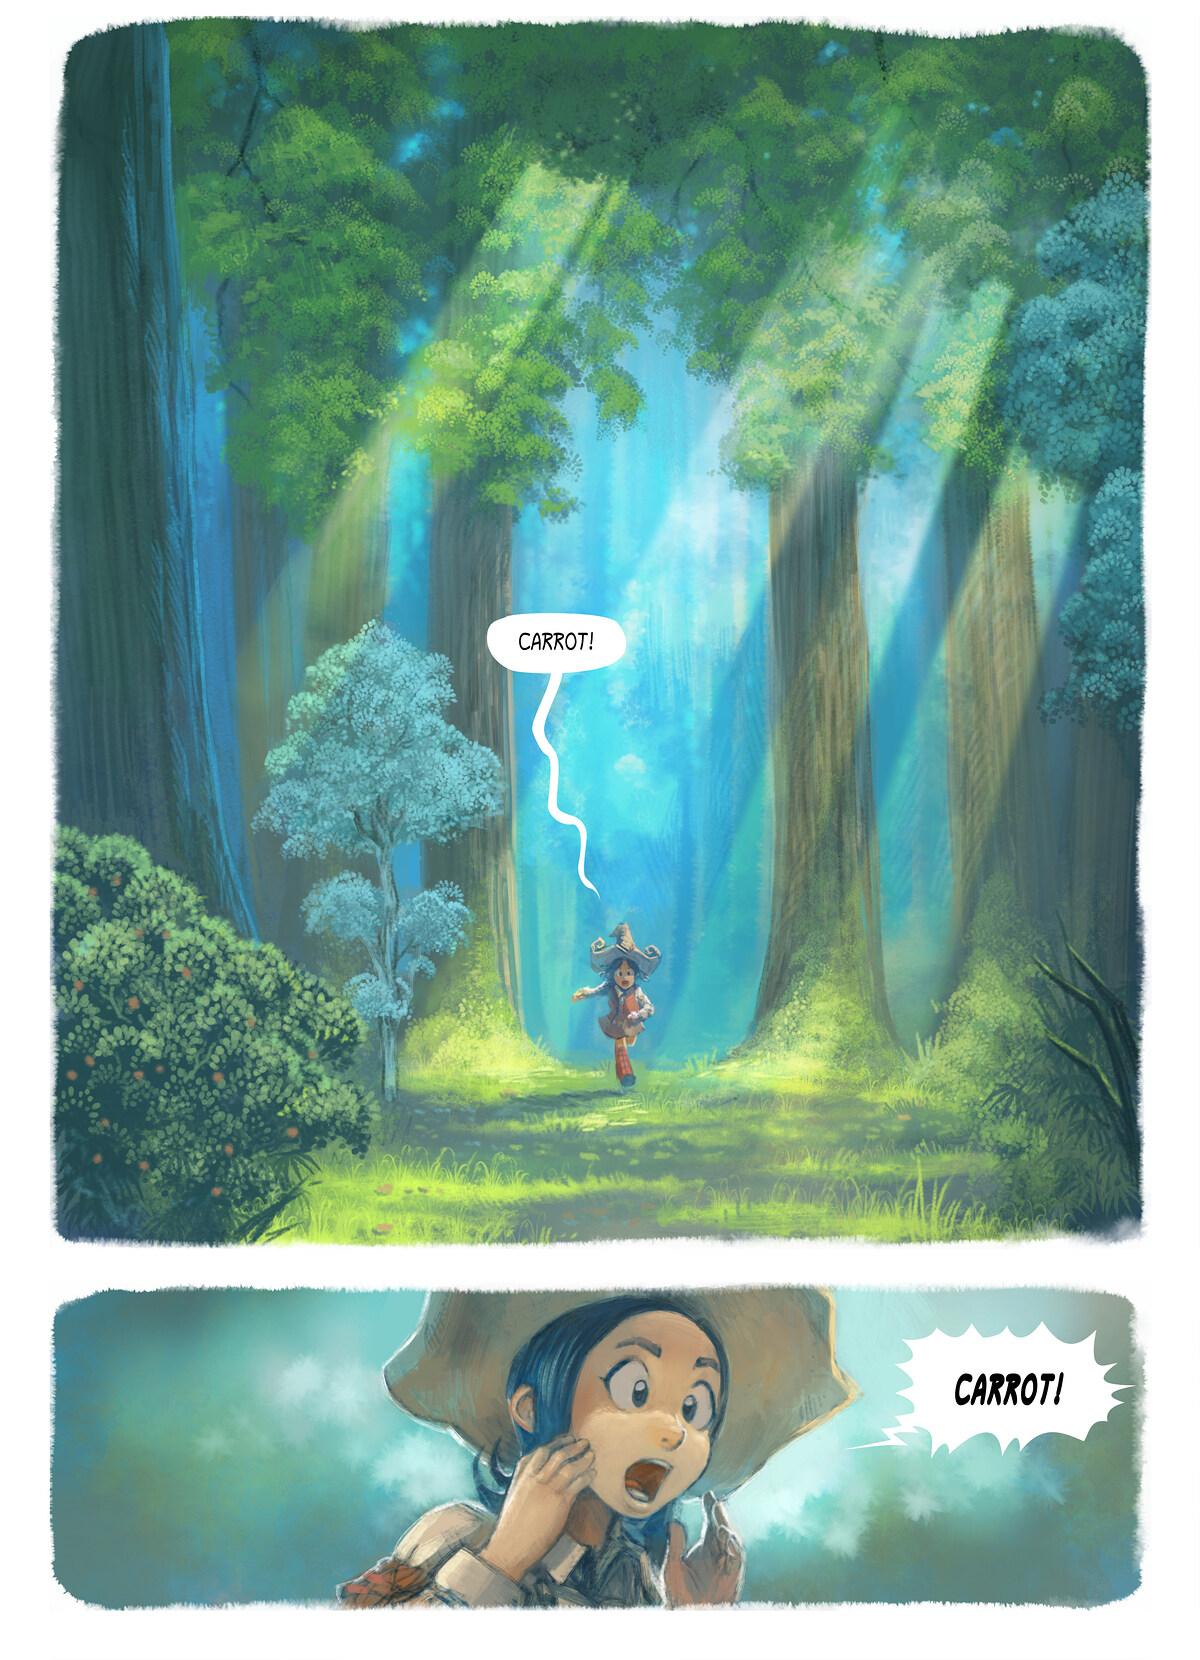 A webcomic page of Pepper&Carrot, rann 7 [br], pajenn 1